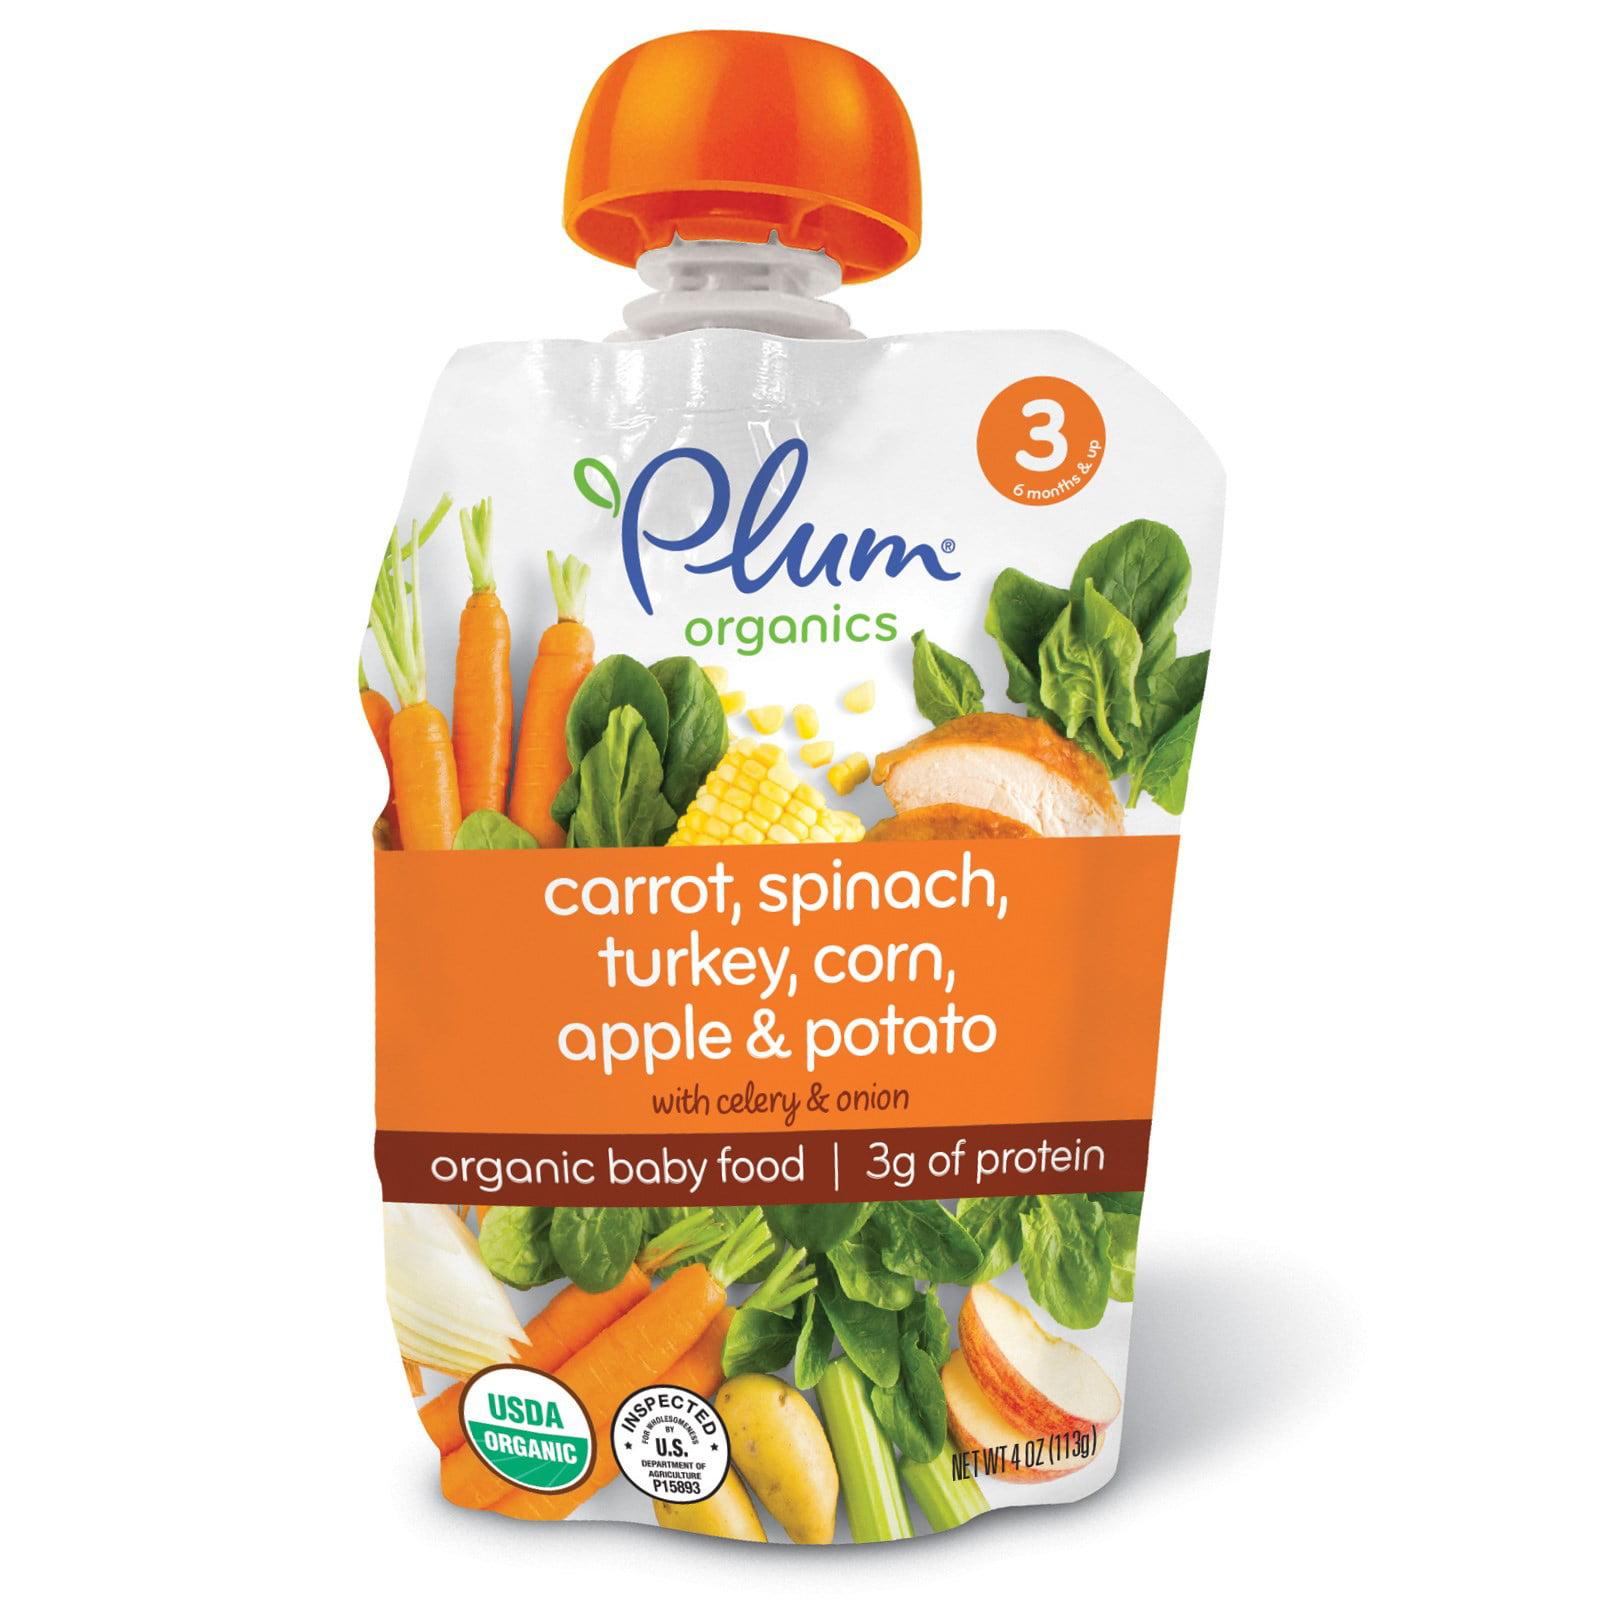 Plum Organics, Organic Baby Food, Stage 3, Carrot, Spinach, Turkey, Corn, Apple & Potato, 4 oz (pack of 4)